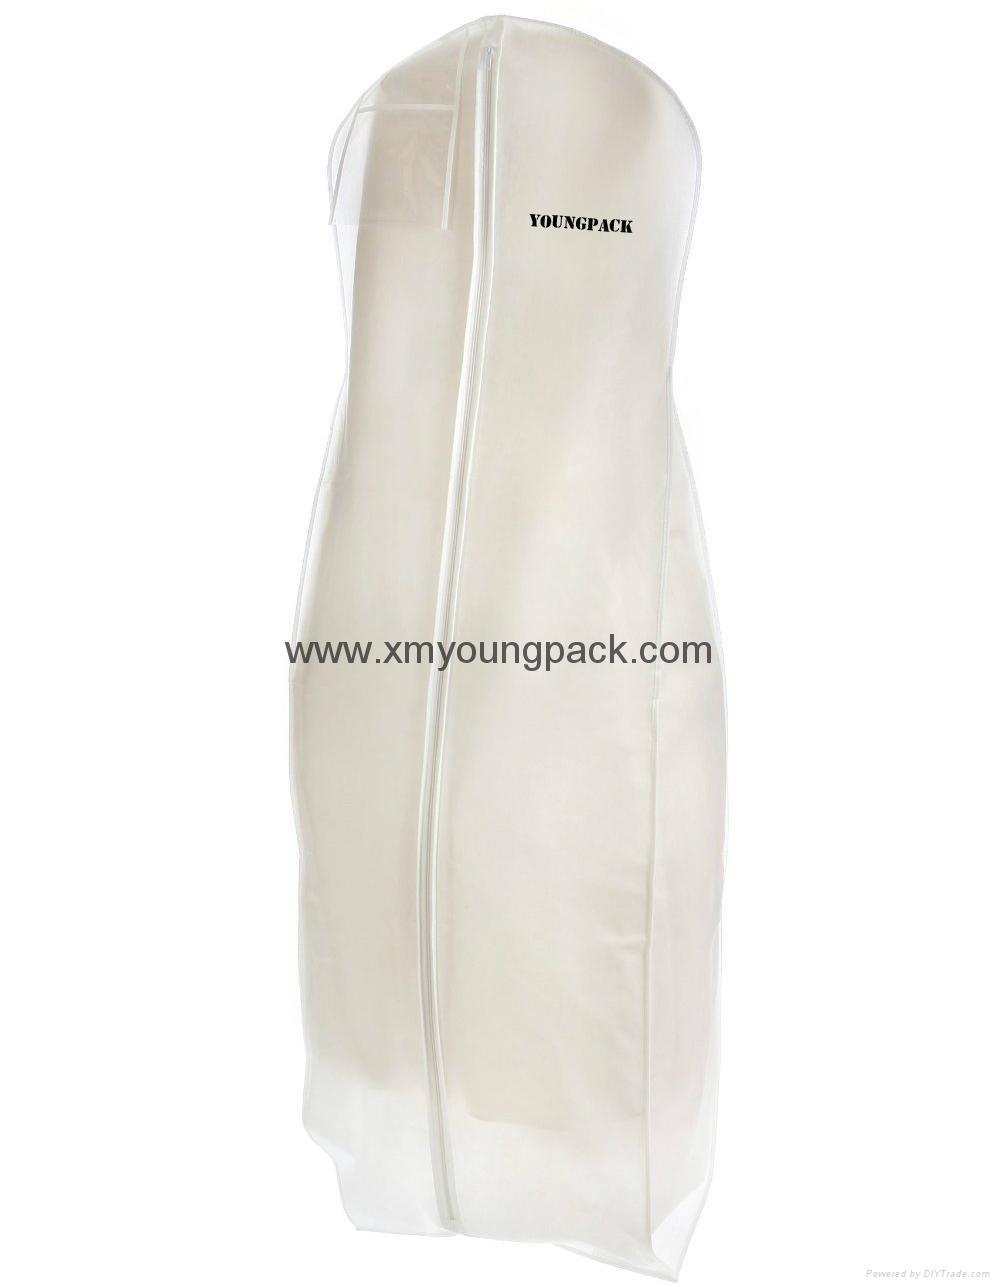 Custom printed white bridal gown dress bag non woven wedding dress cover 1